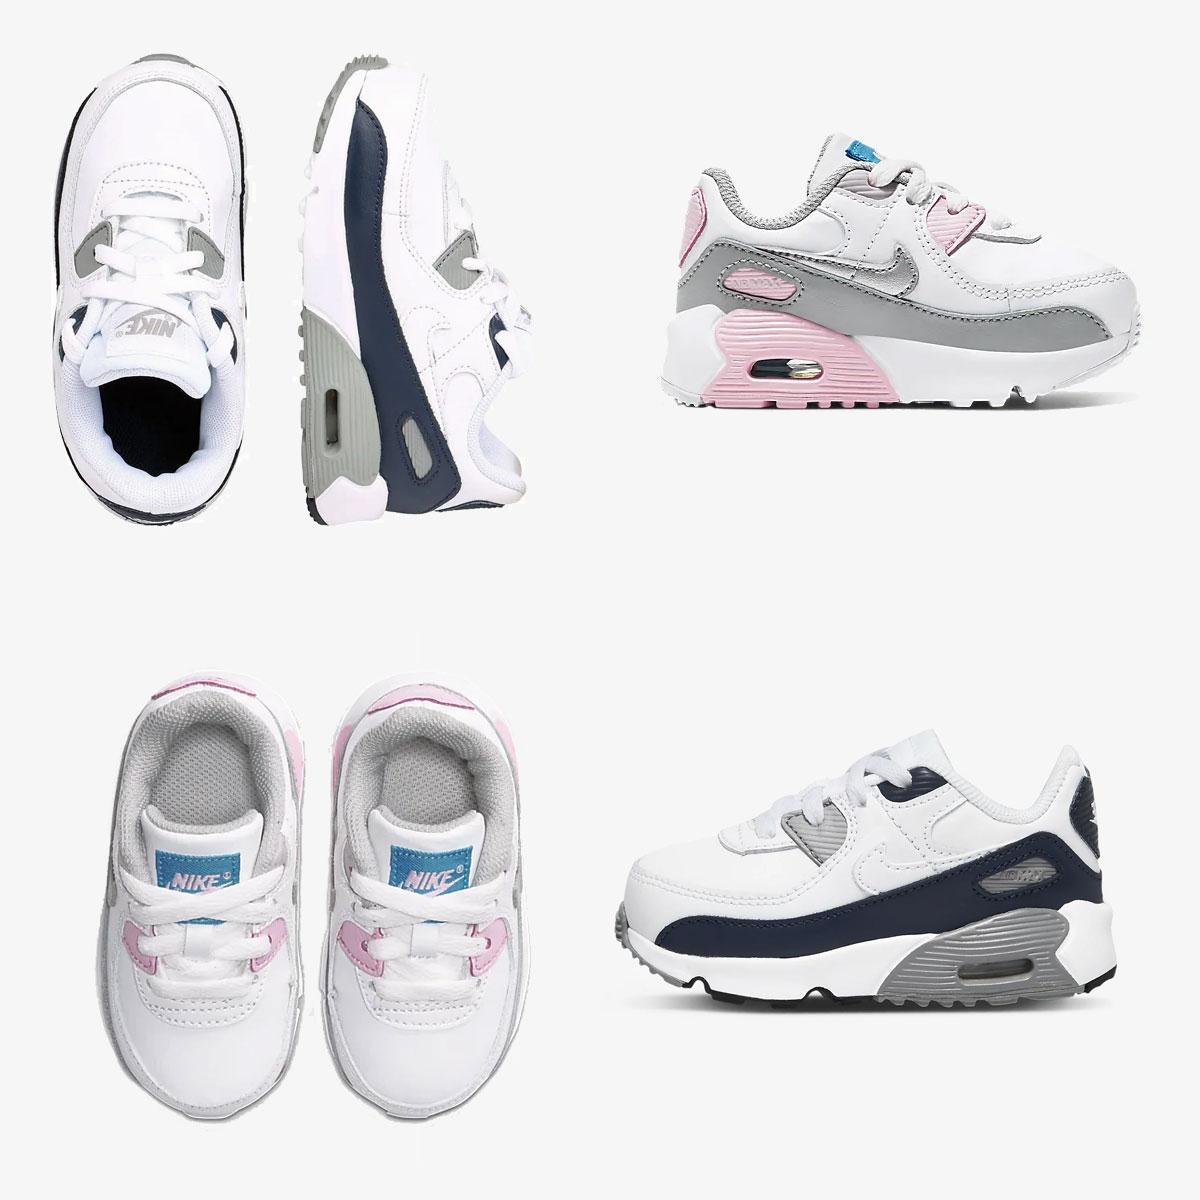 Nike Air Max 90 kids sneakers NIKE